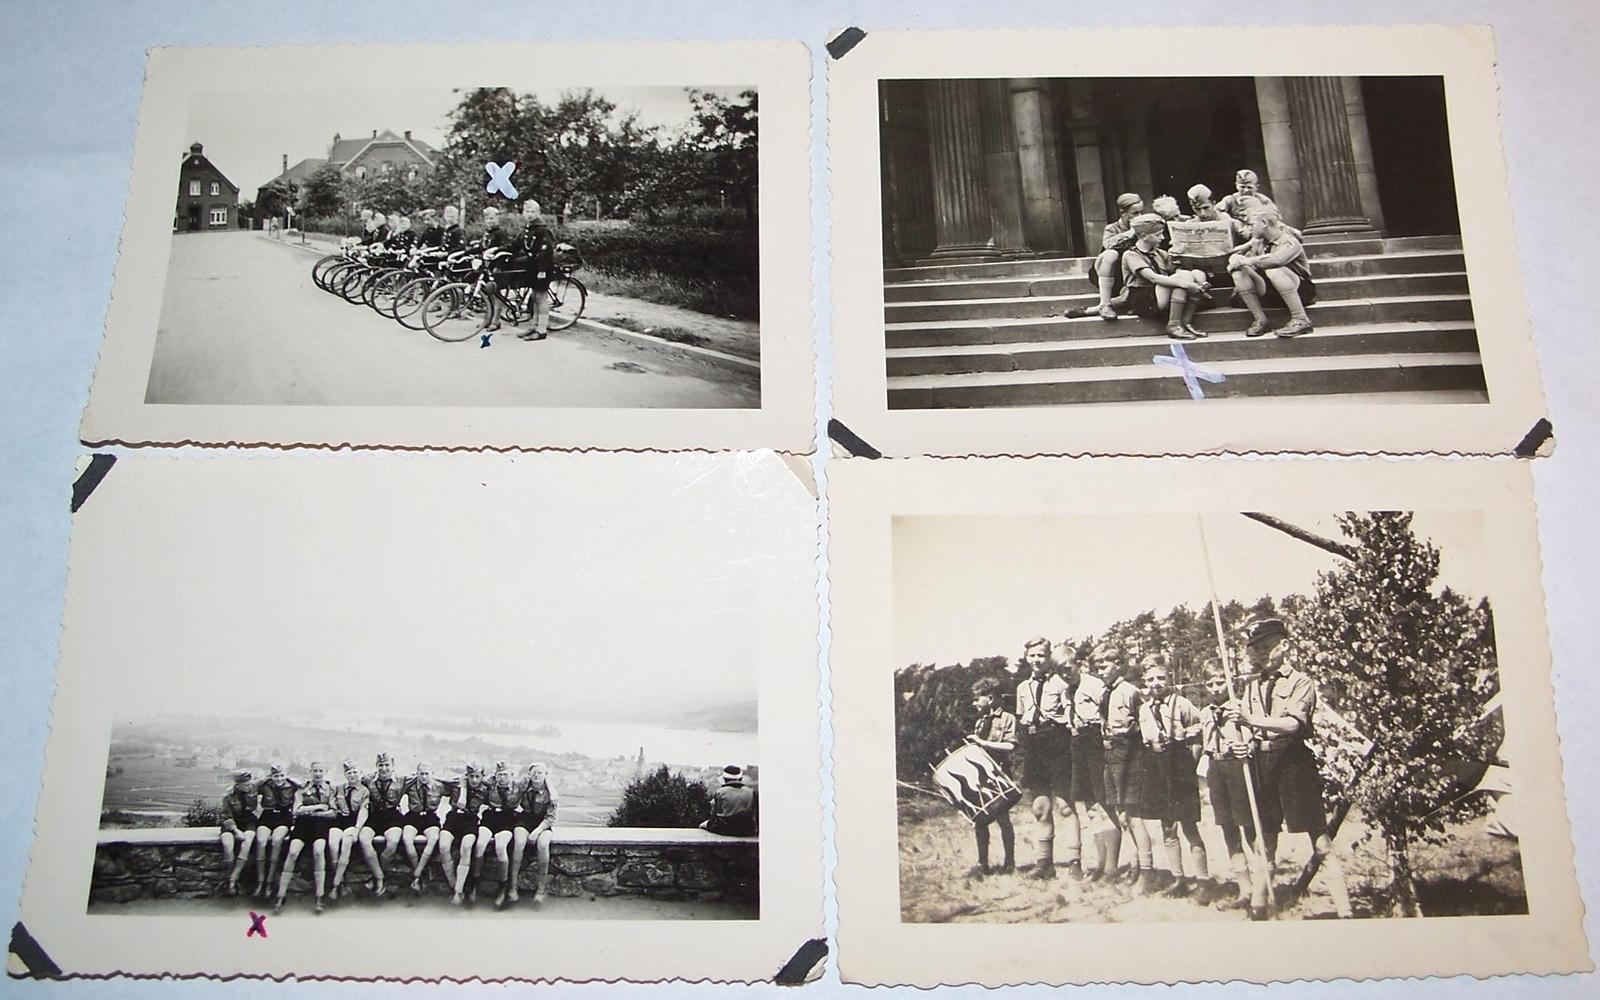 33 ORIGINAL HITLER YOUTH PHOTOS GROUPING FROM 1 BOY, 1936-39